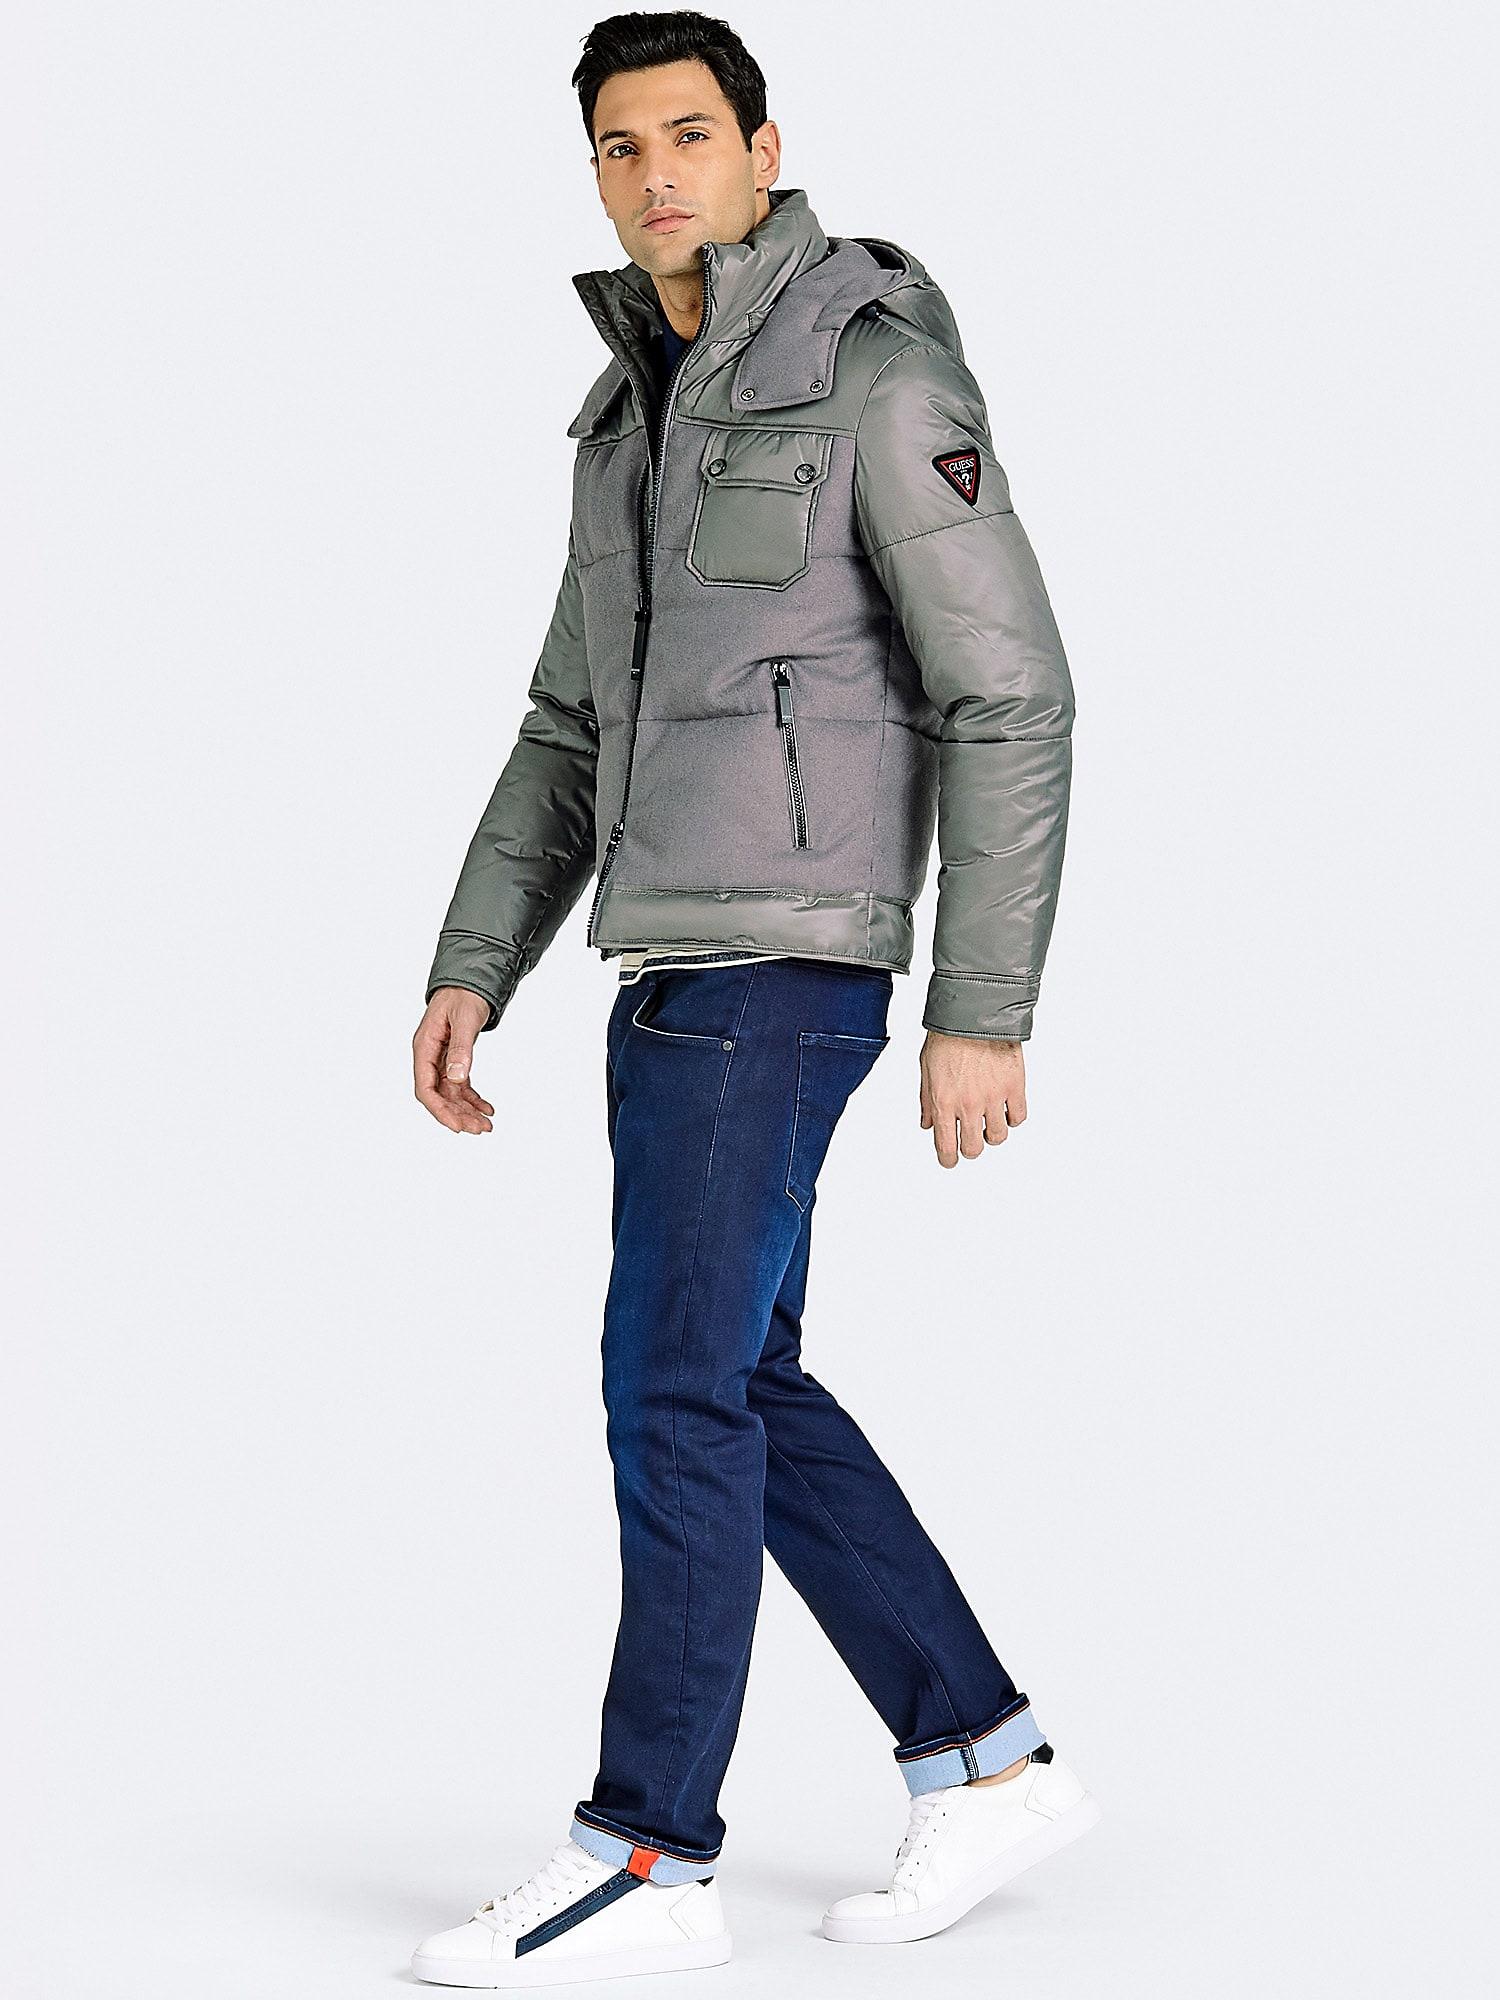 Pocket Detail Padded Jacket Small £55.50 @ Guess